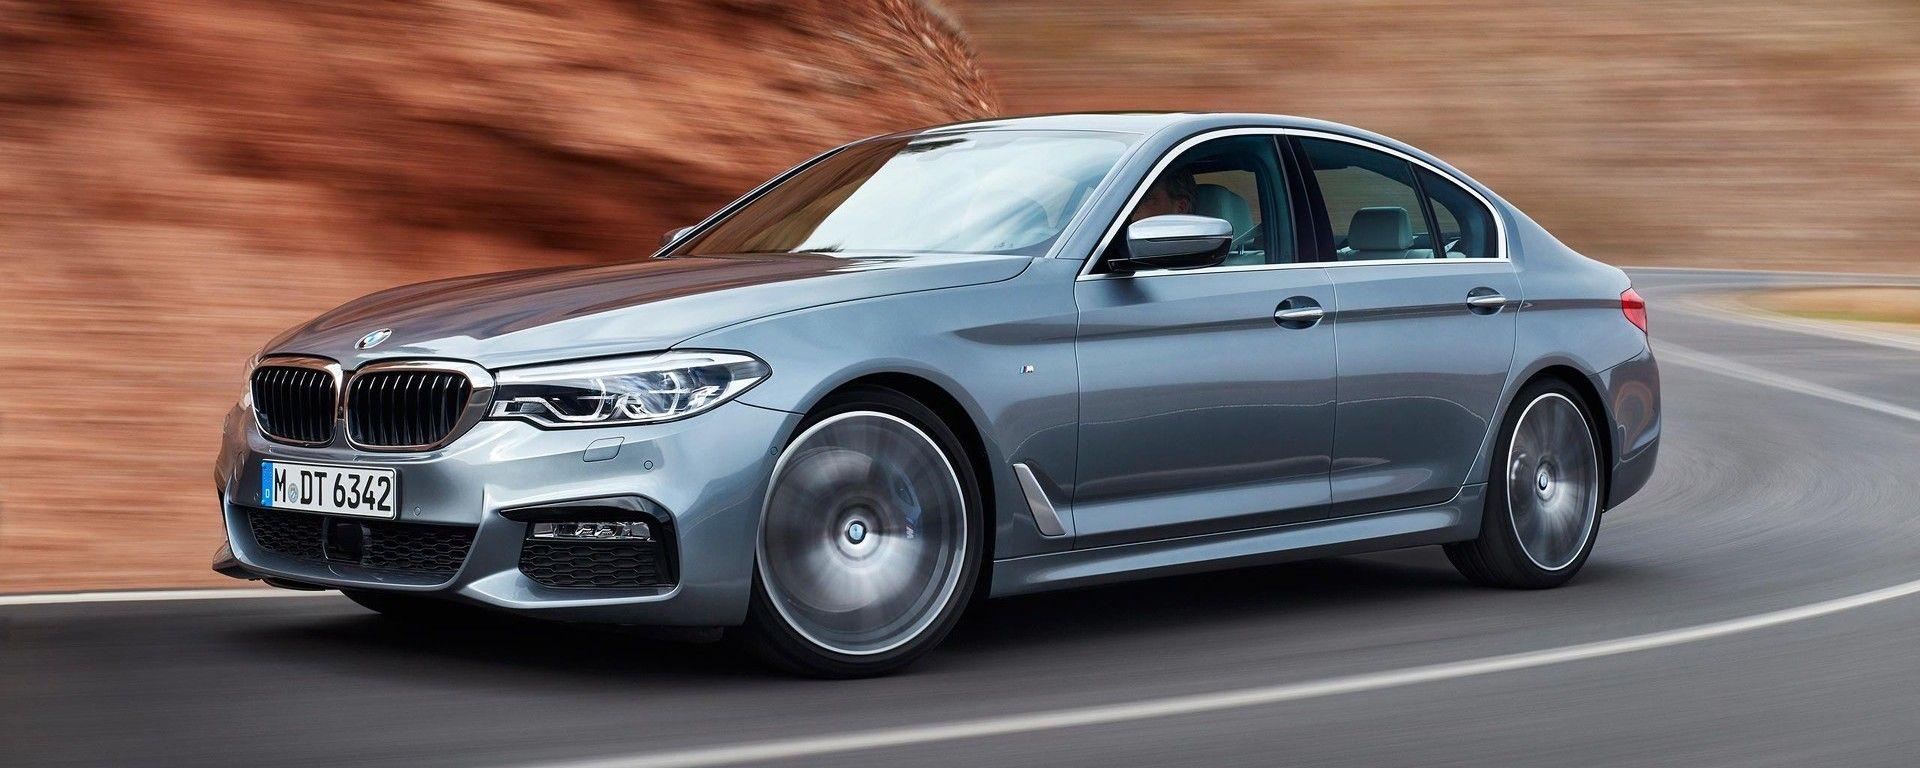 Nuova BMW Serie 5: prova, dotazioni, prezzi [Video]